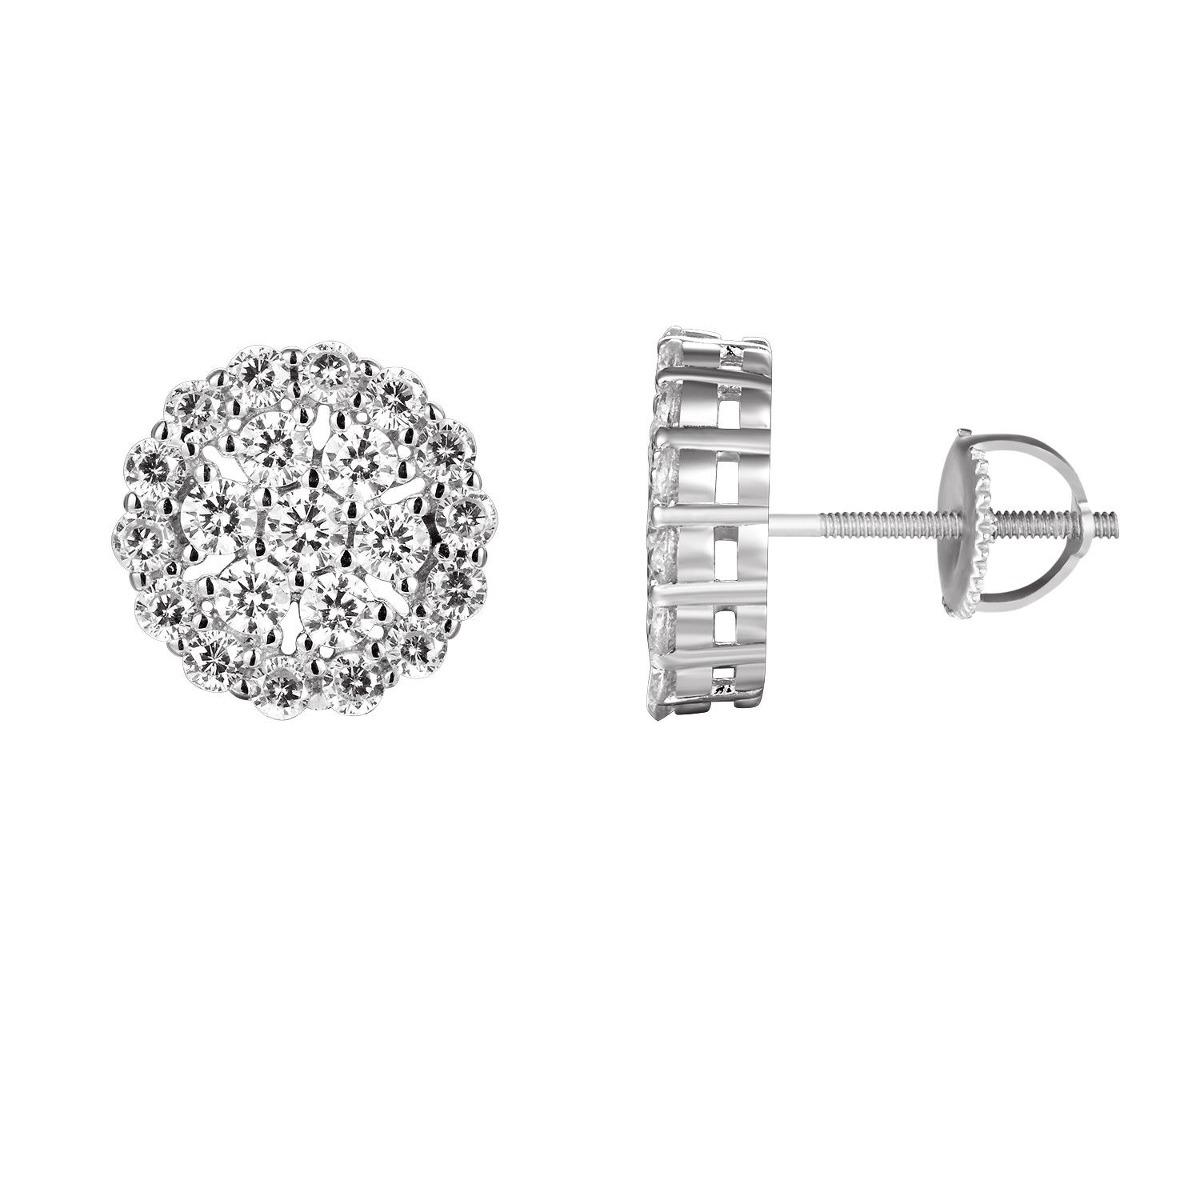 e69cf7c07311 solitario redondo cluster pendientes plata de ley diamantes. Cargando zoom.